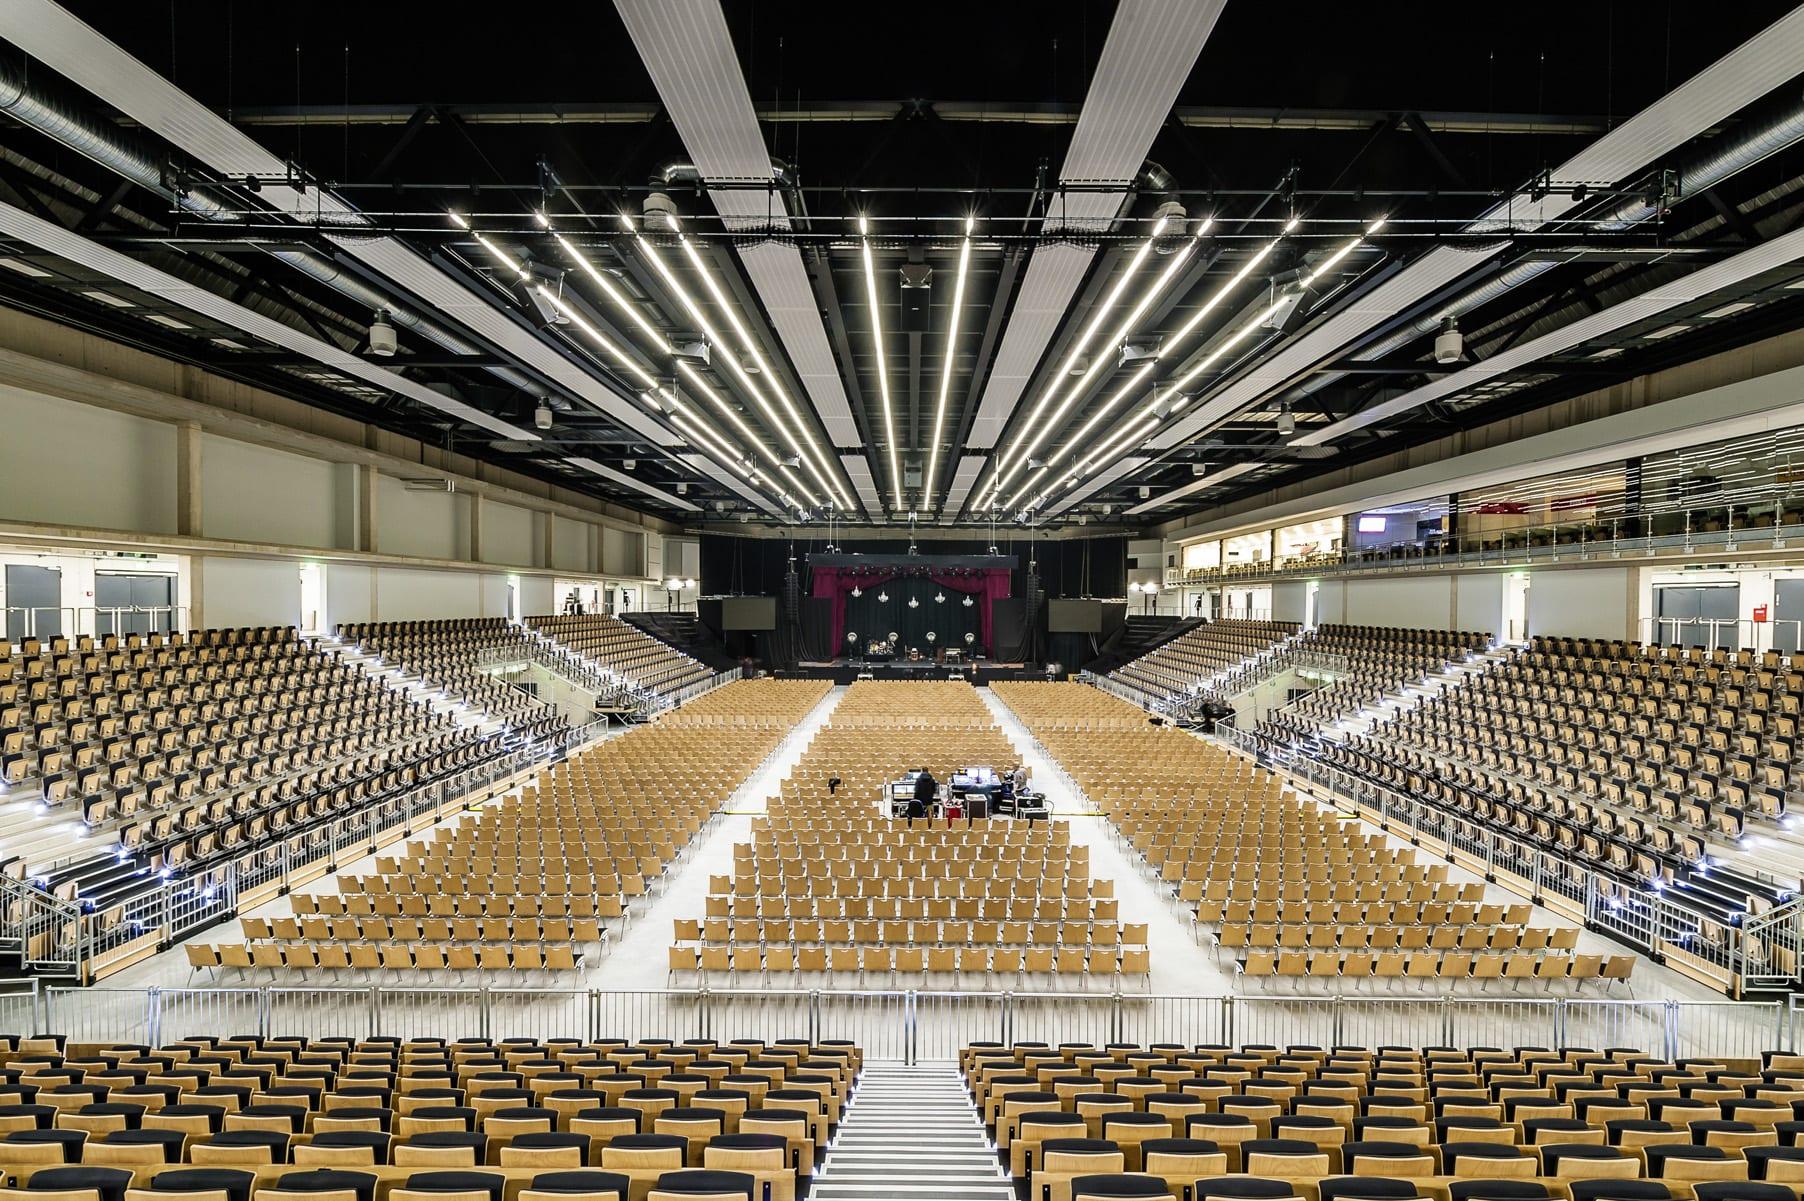 Architekten Lingen die emsland arena in lingen pbr planungsbüro rohling ag architekten